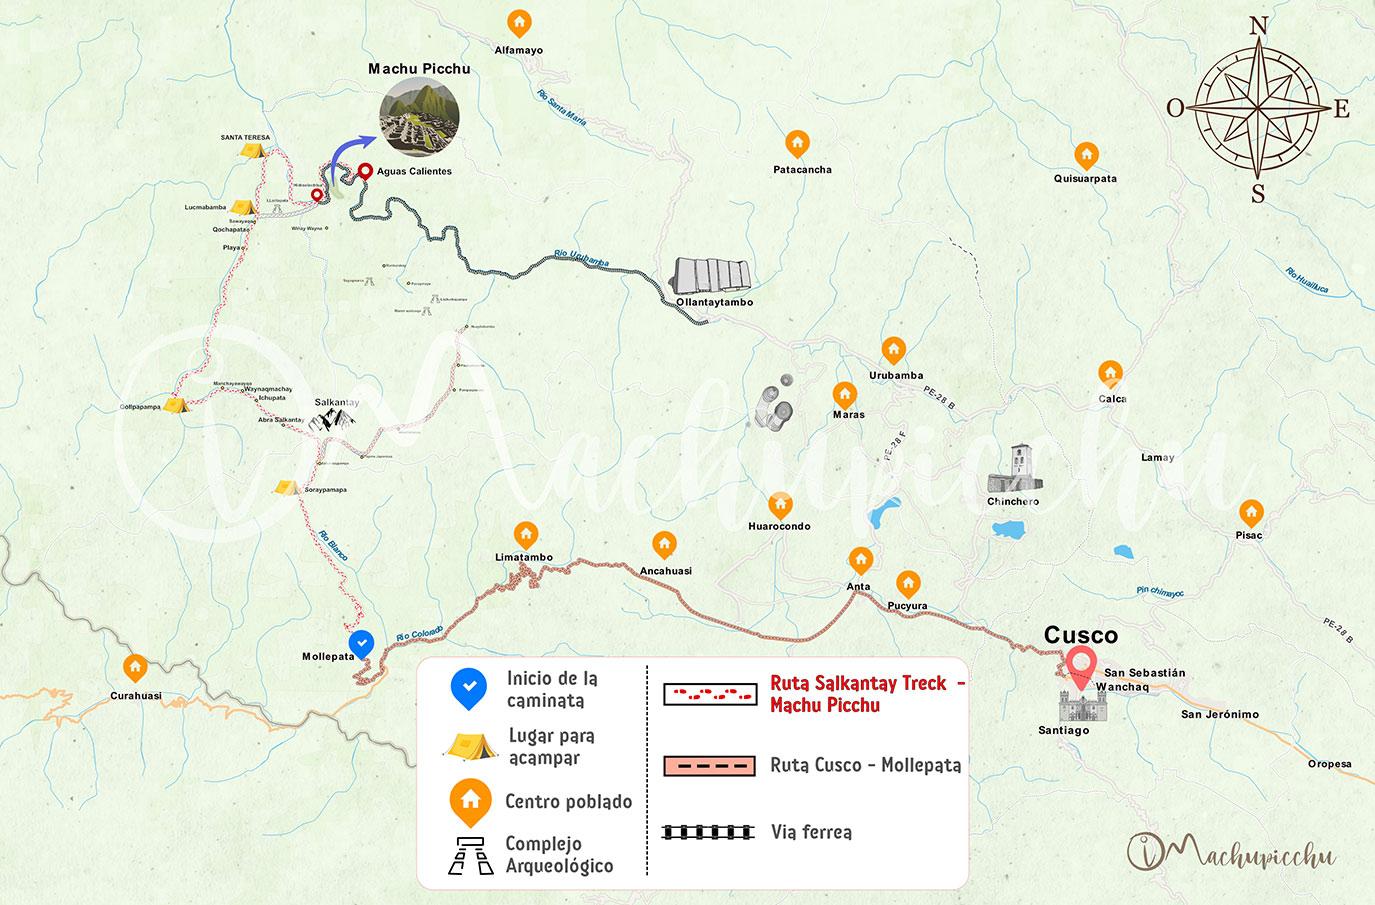 Mapa del Salkantay Trek a Machu Picchu